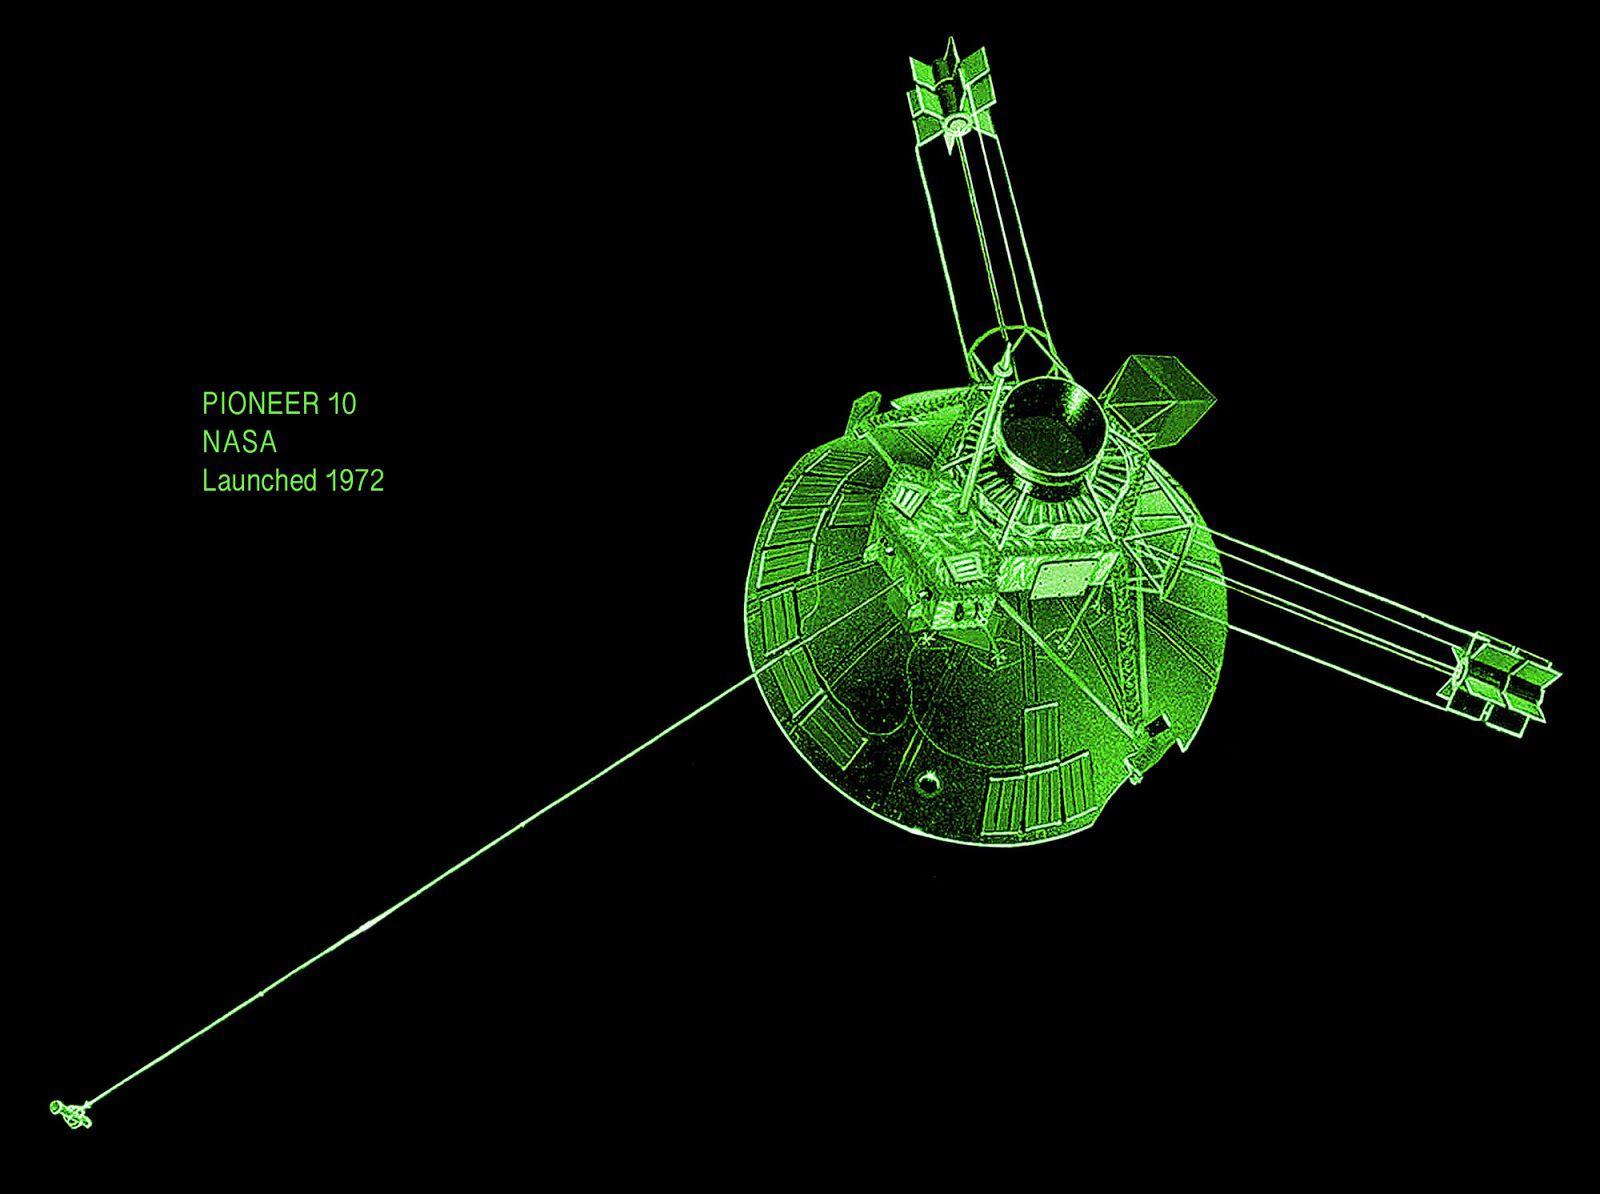 An illustration of Pioneer 10.